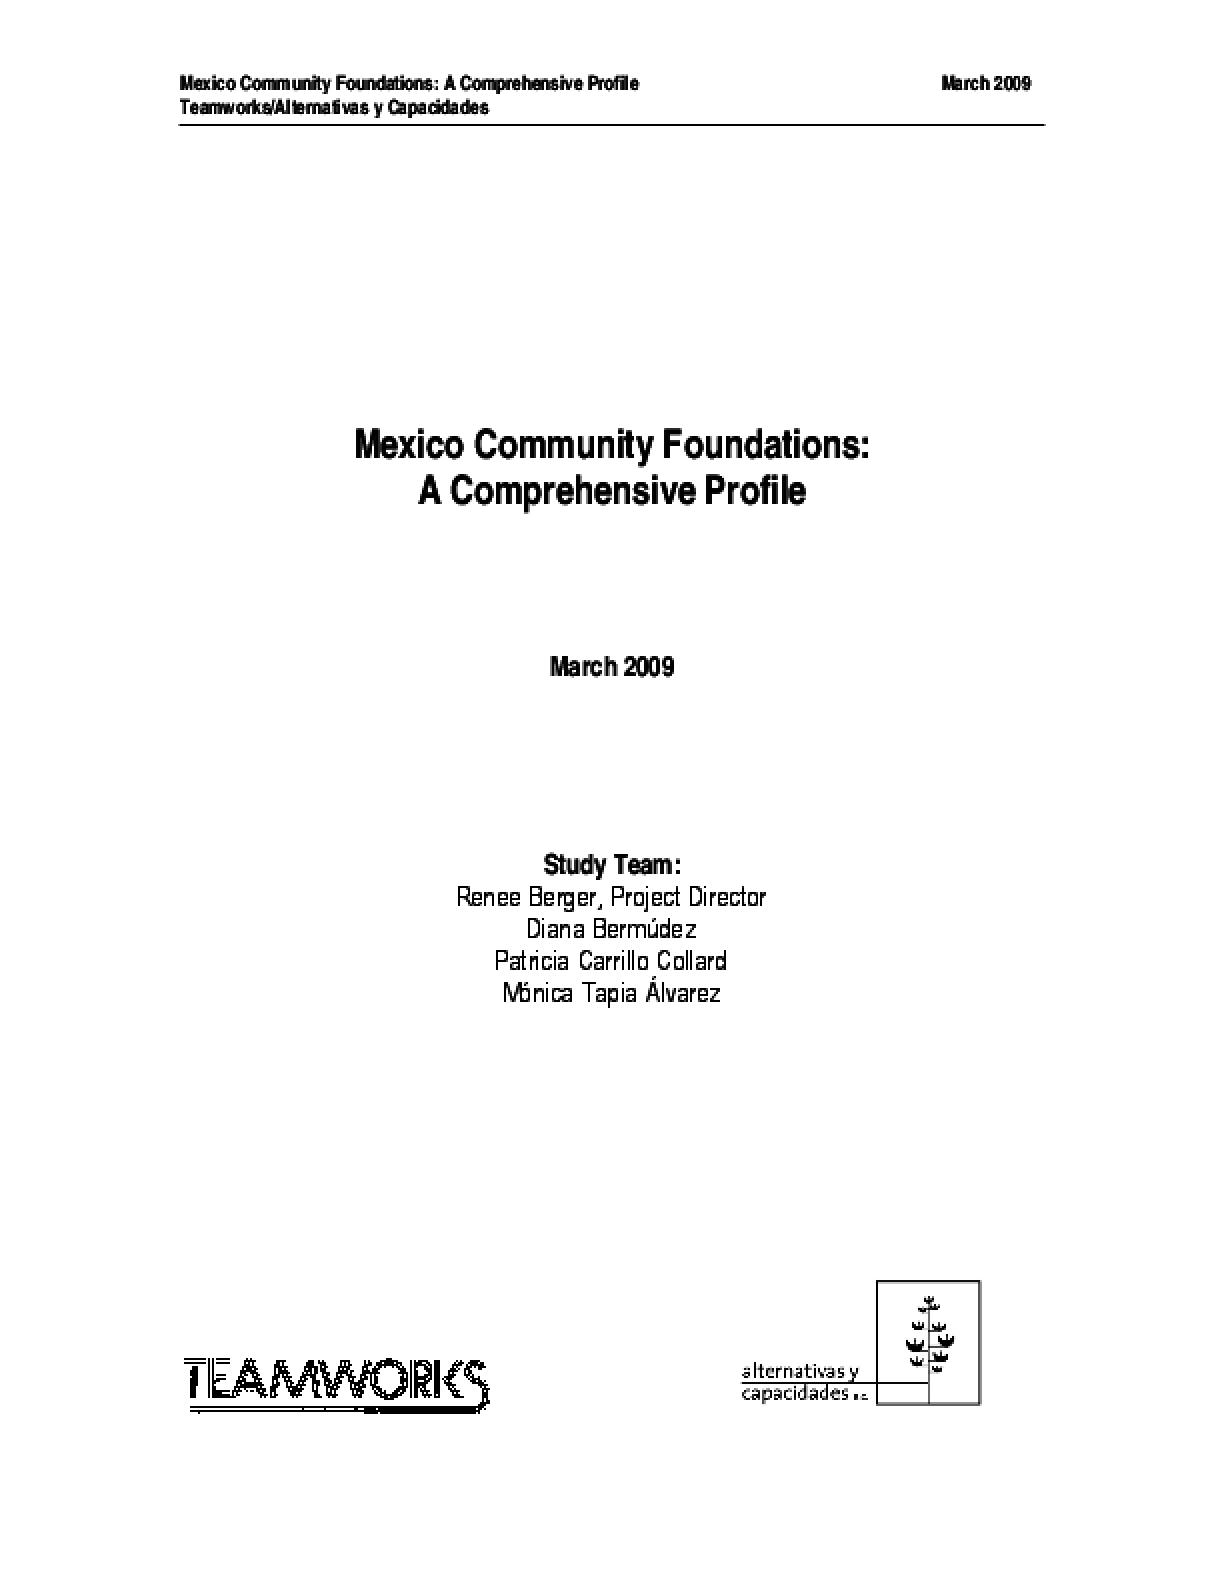 Mexico Community Foundations: A Comprehensive Profile